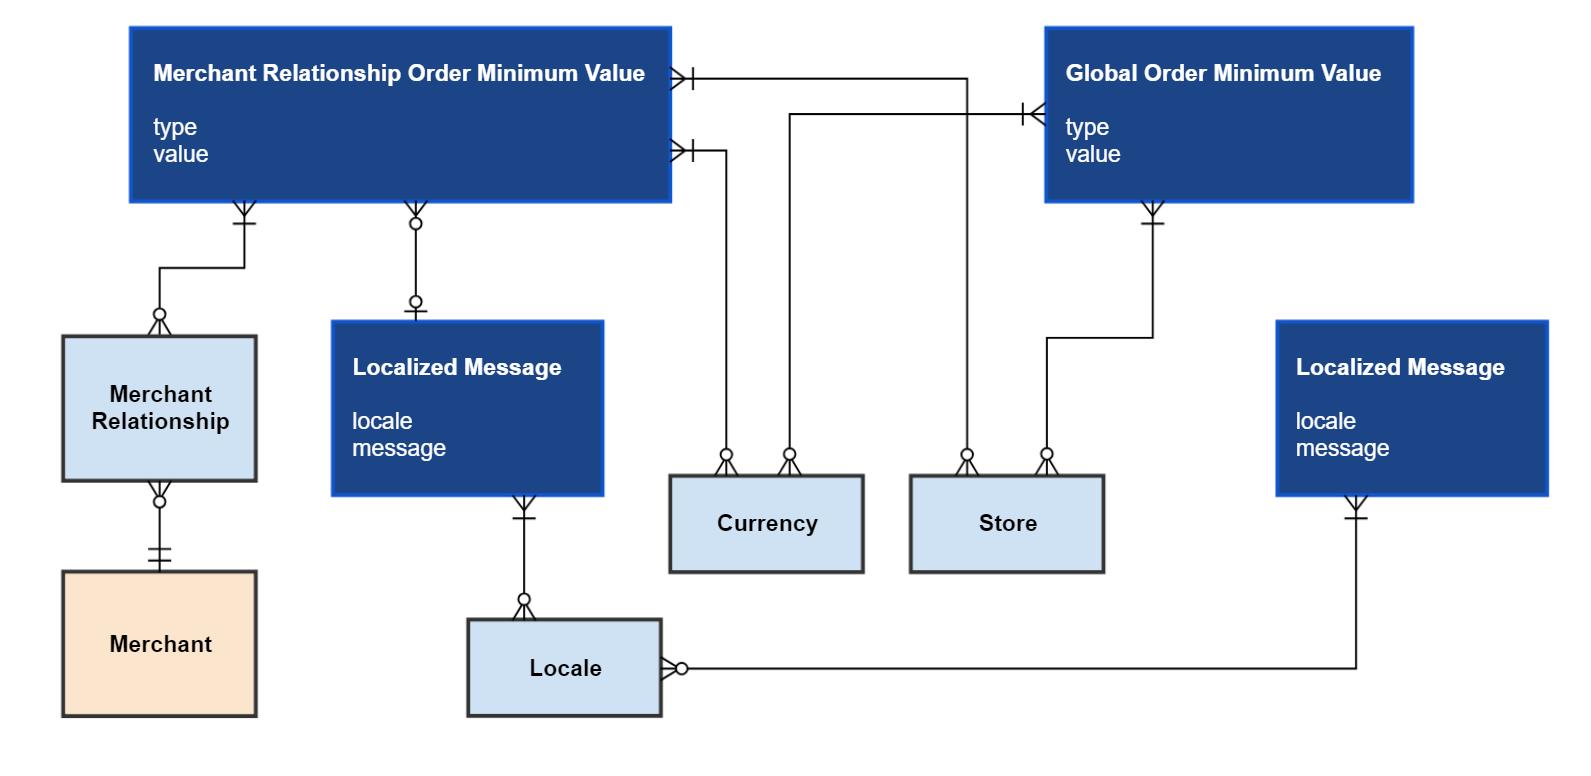 context-of-the-minimum-order-value-module